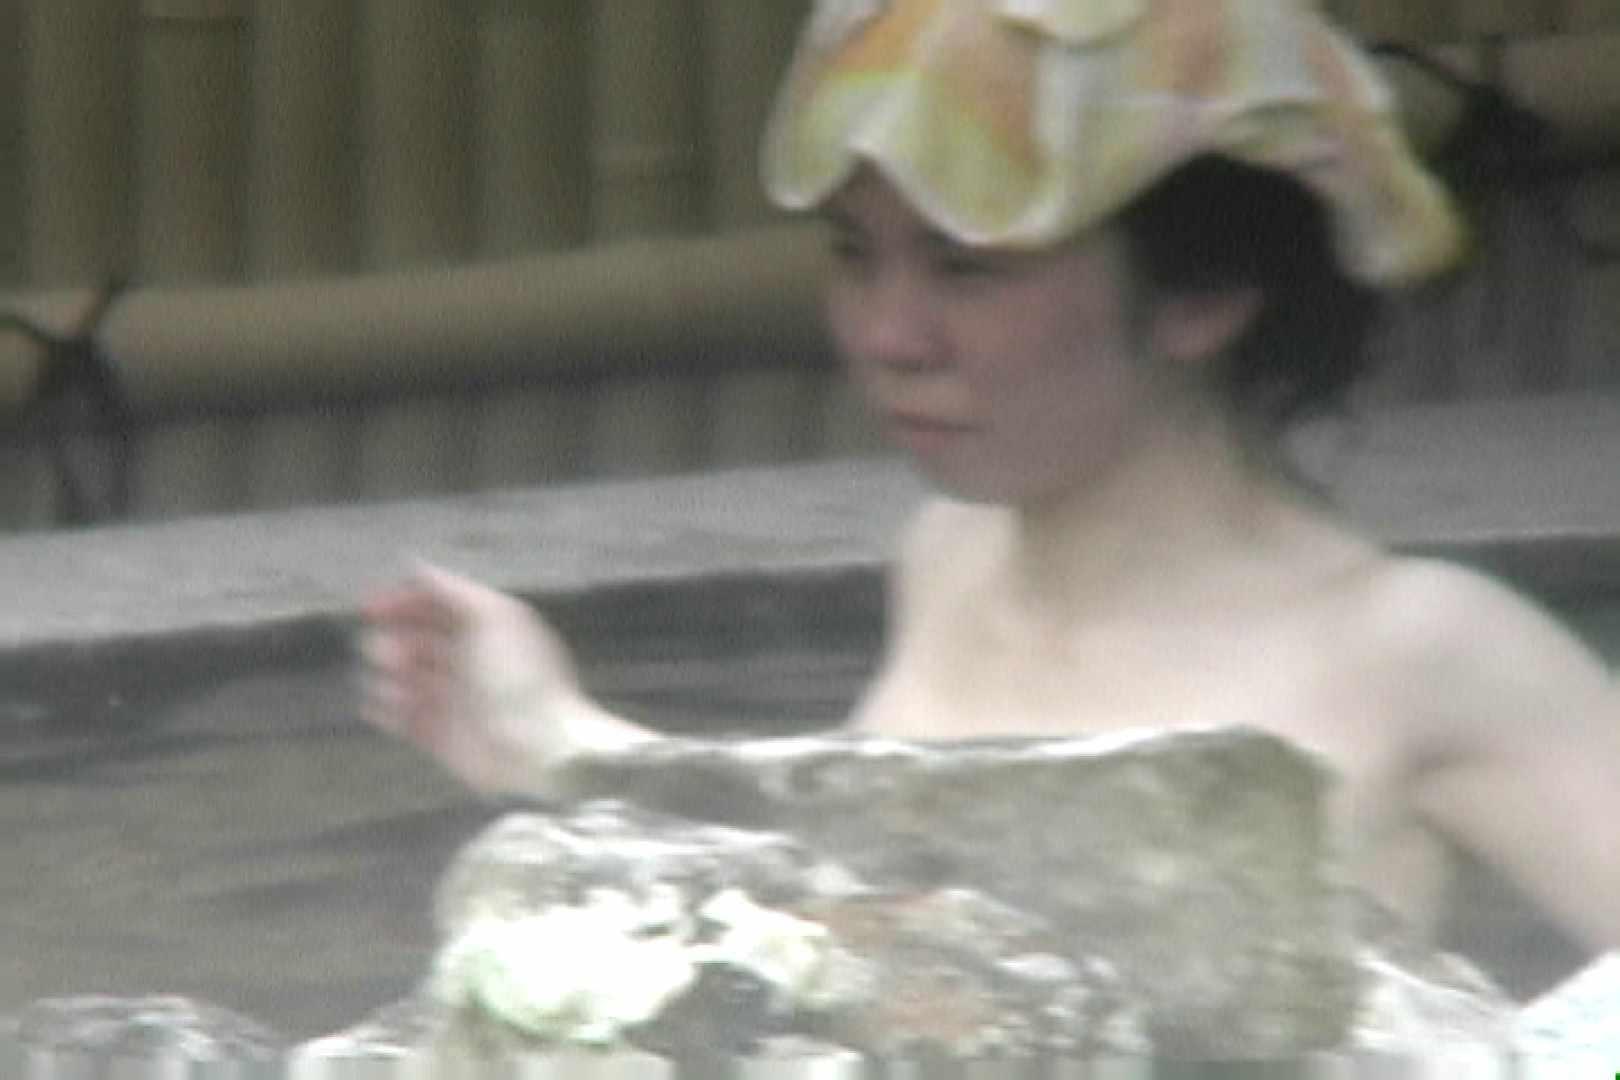 Aquaな露天風呂Vol.687 盗撮シリーズ | 露天風呂編  93PIX 27